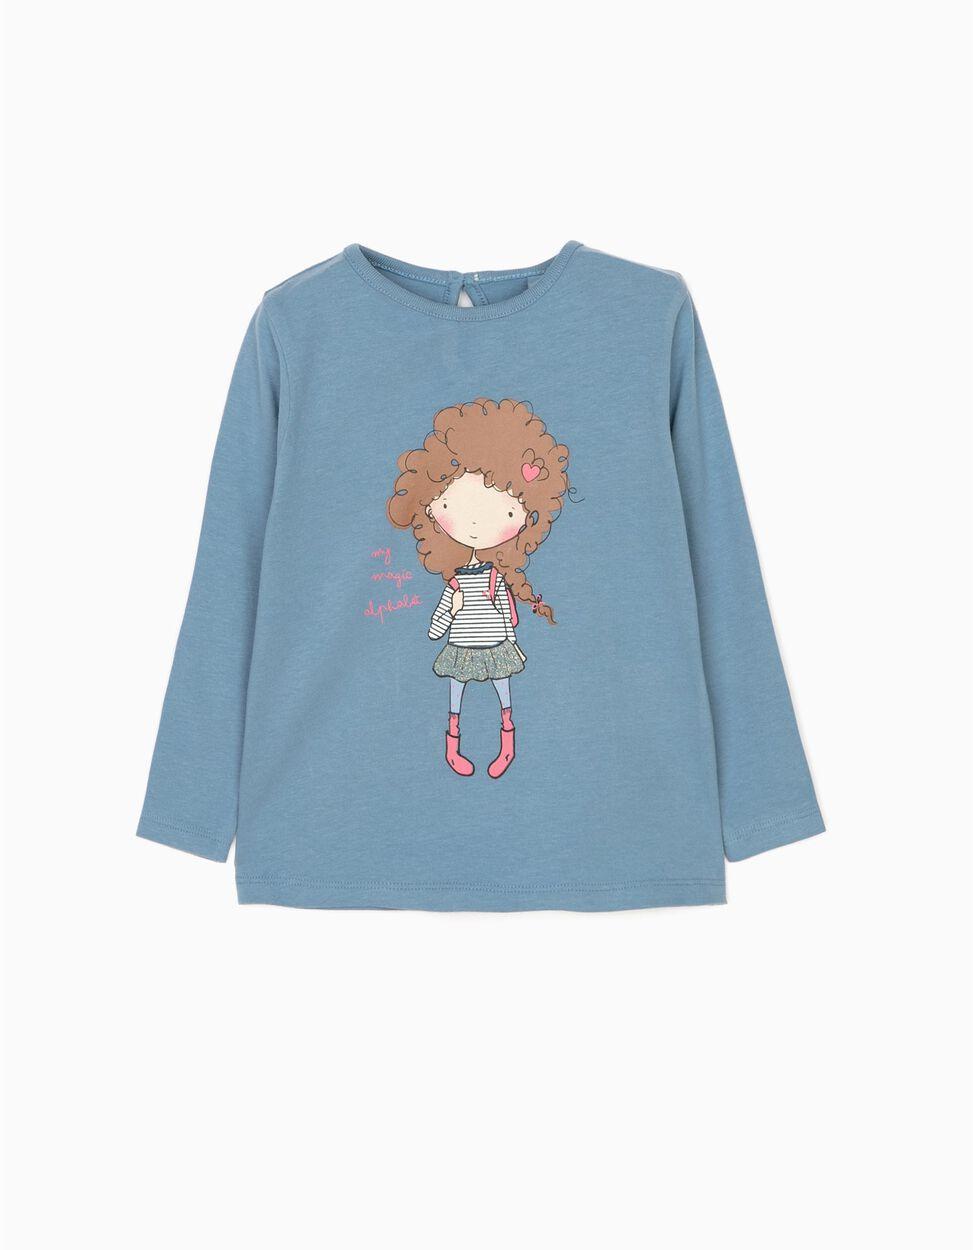 T-shirt Manga Comprida Love School Branca